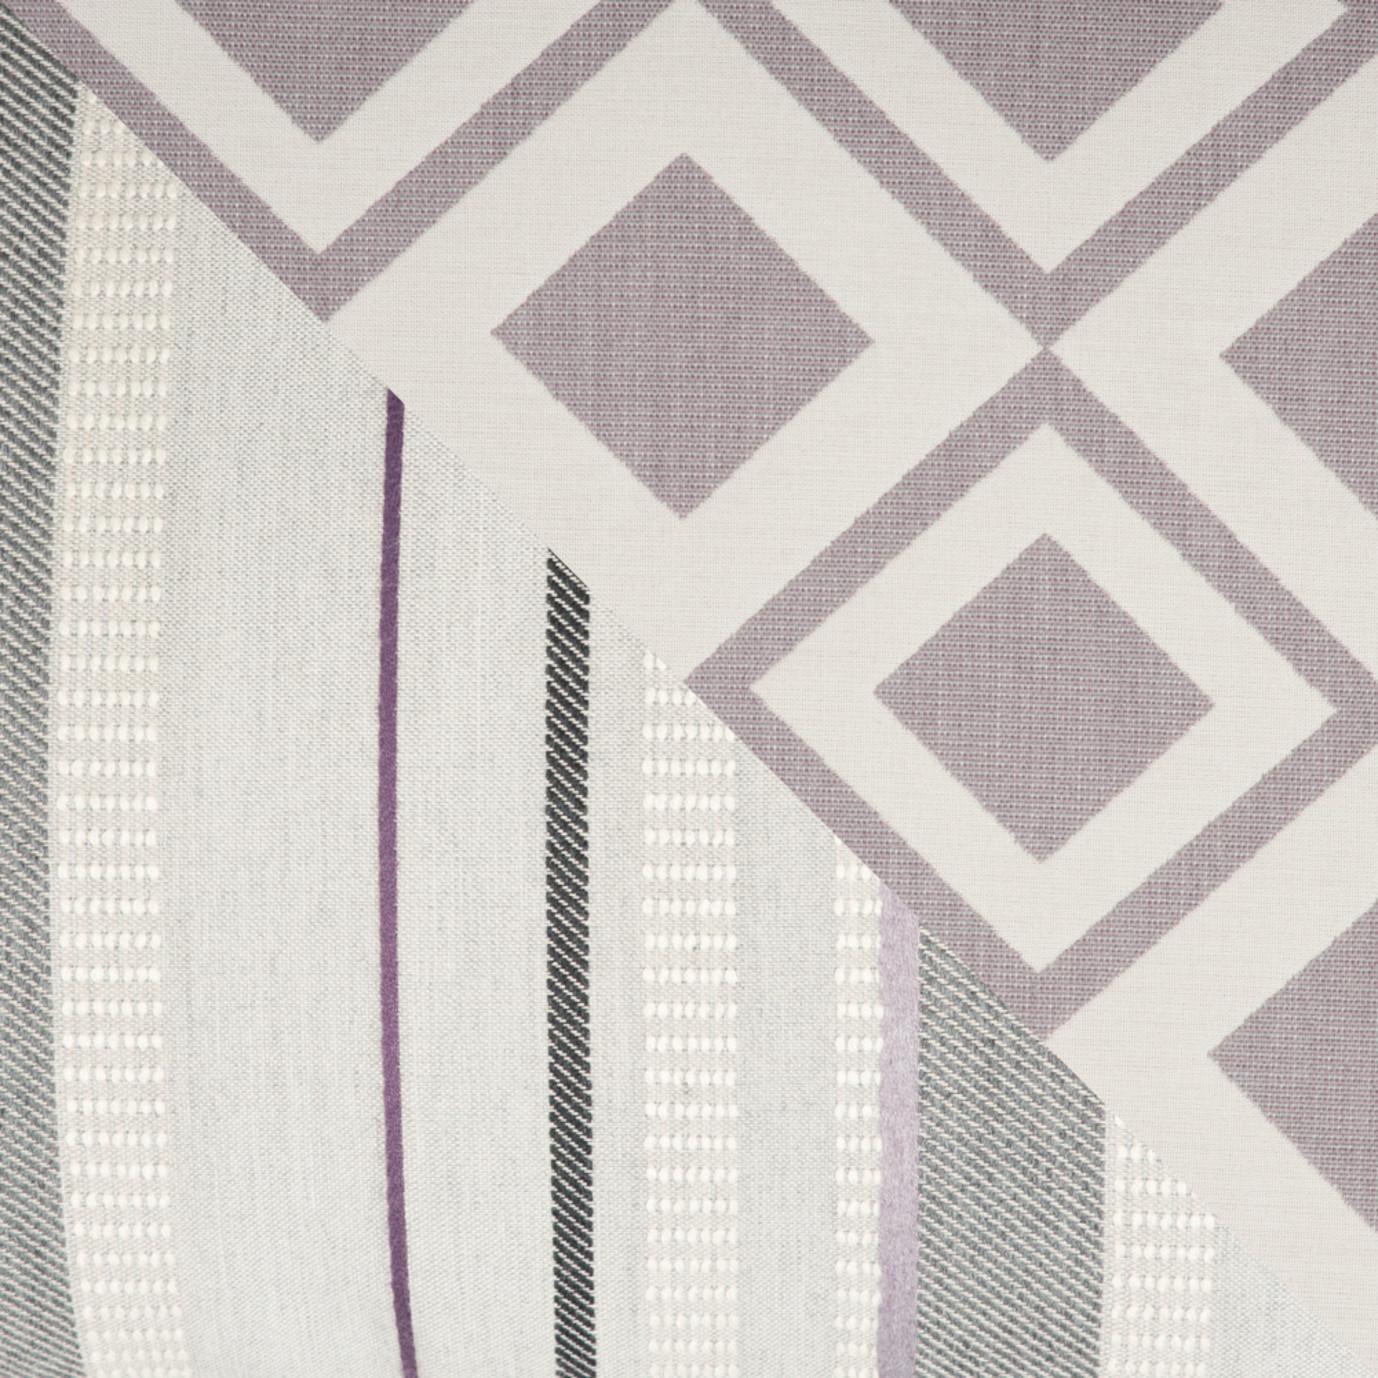 Deco™ Deluxe 5pc Motion Fire Chat Set - Wisteria Lavender